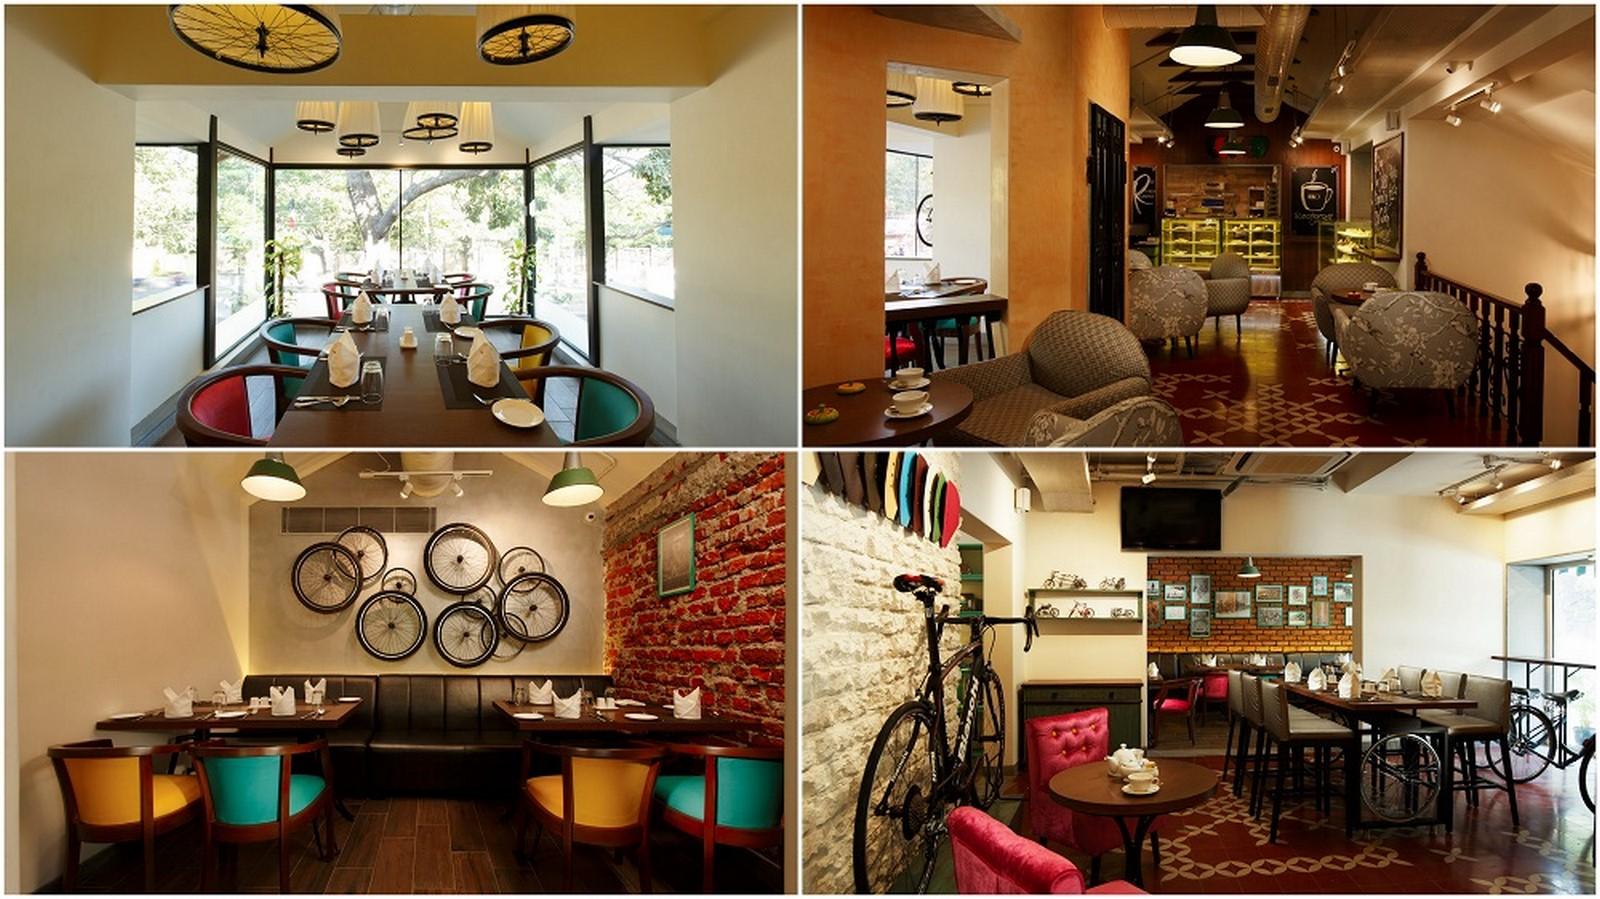 30 Beautiful restaurants in India - Sheet7